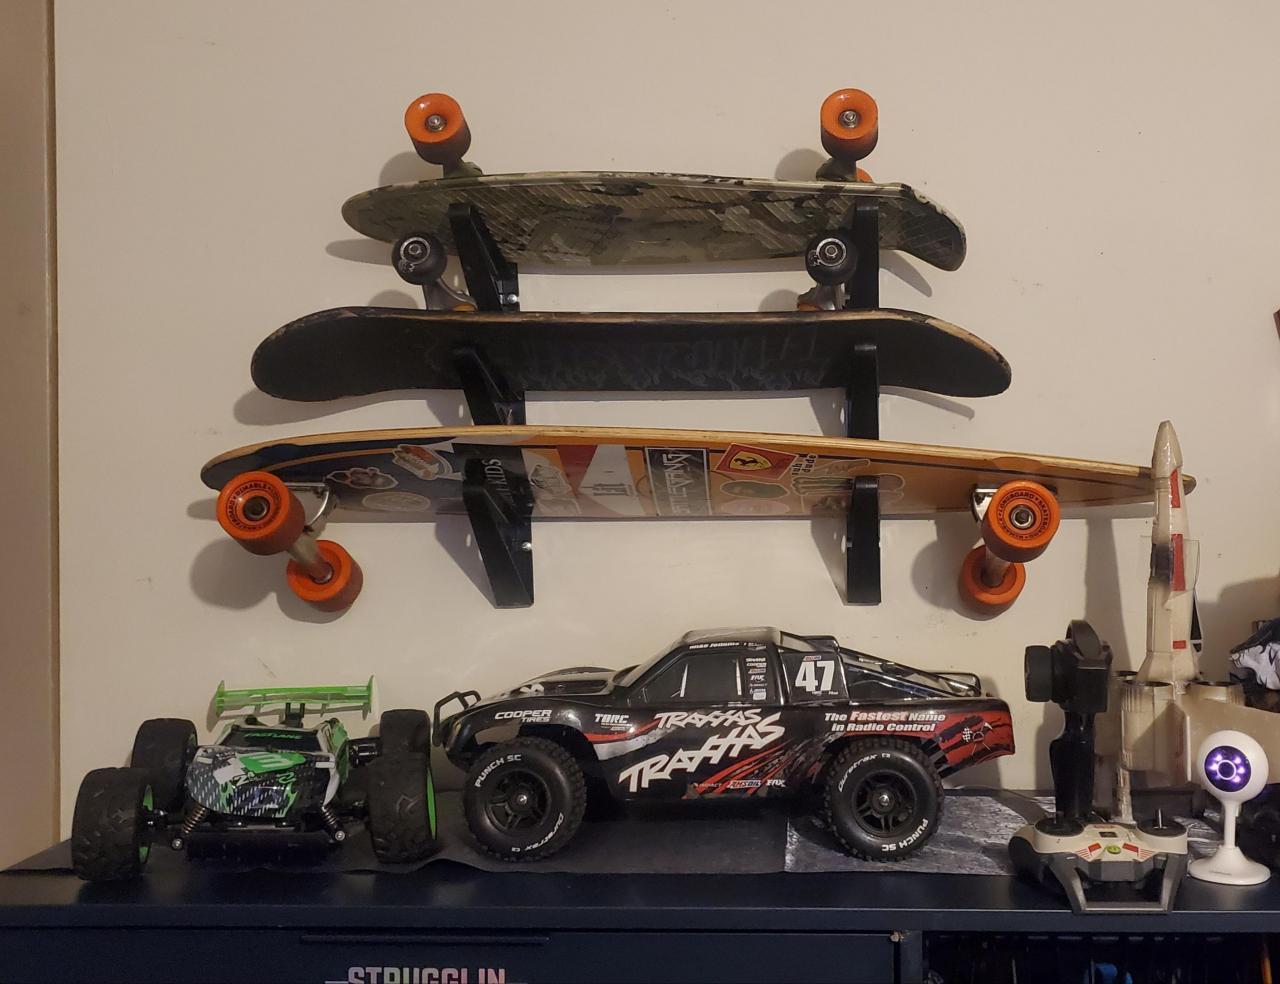 Skateboard Deck Wall Display Rack Shop or Home Use CNC Cut Longboard Snowboard